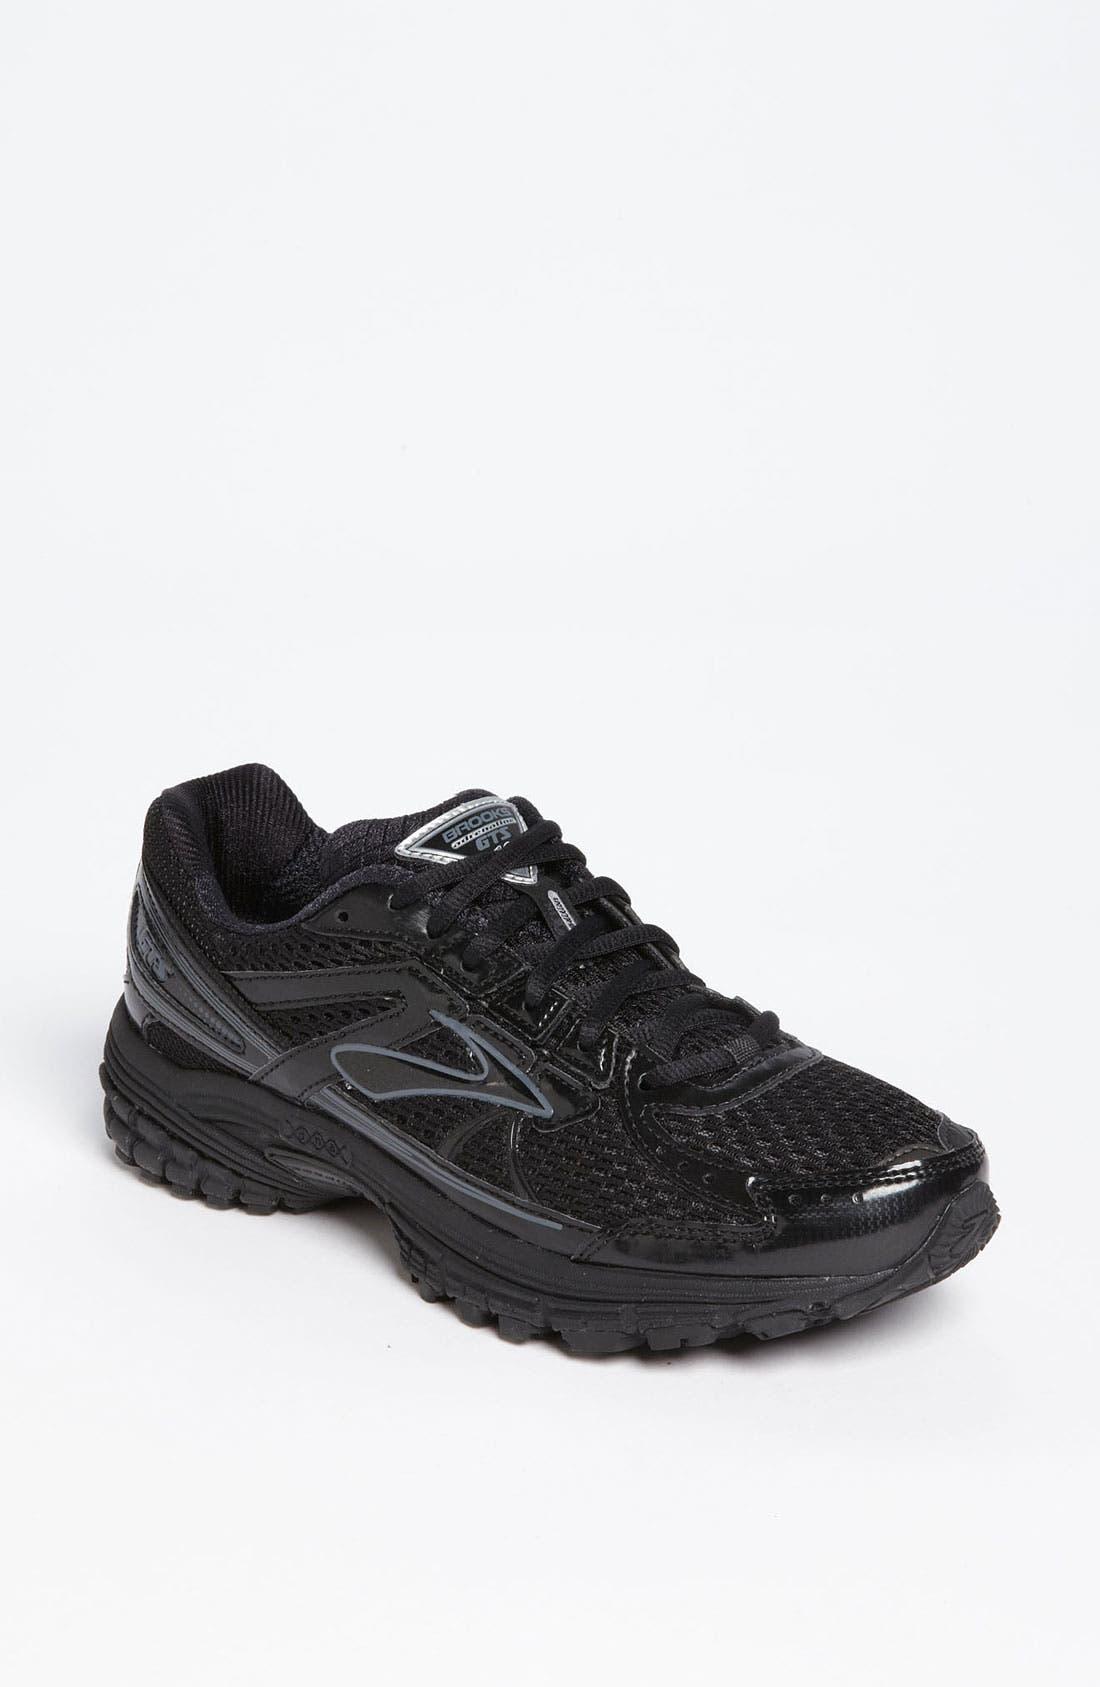 Main Image - Brooks 'Adrenaline GTS 13' Running Shoe (Women)(Regular Retail Price: $109.95)